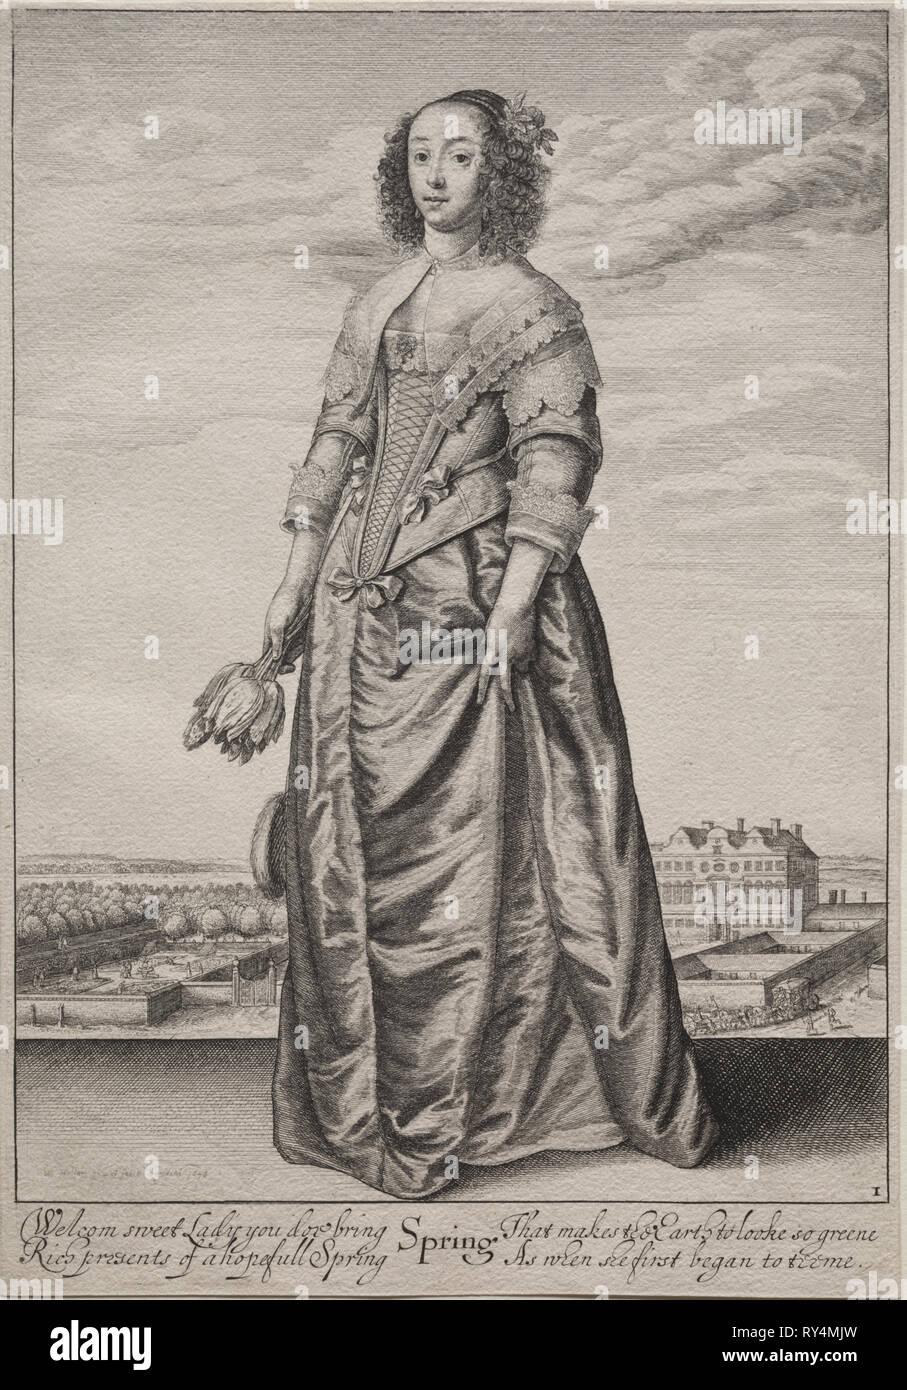 The Seasons, 1643-1644. Wenceslaus Hollar (Bohemian, 1607-1677)